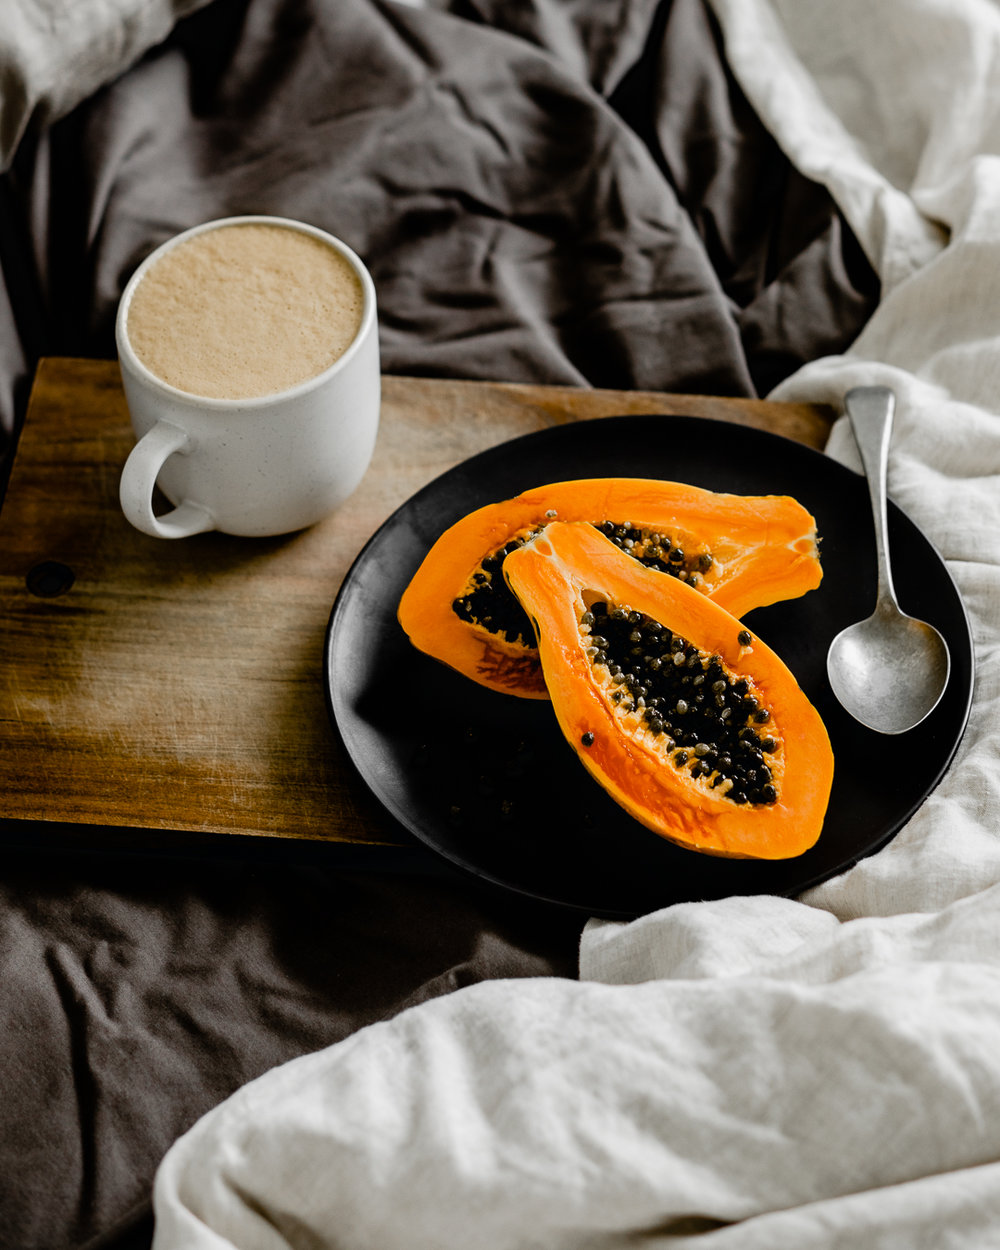 Howtocreateyourownbedroomsanctuary_by_Jordan_Pie_Nutritionist_Photographer-1.jpg